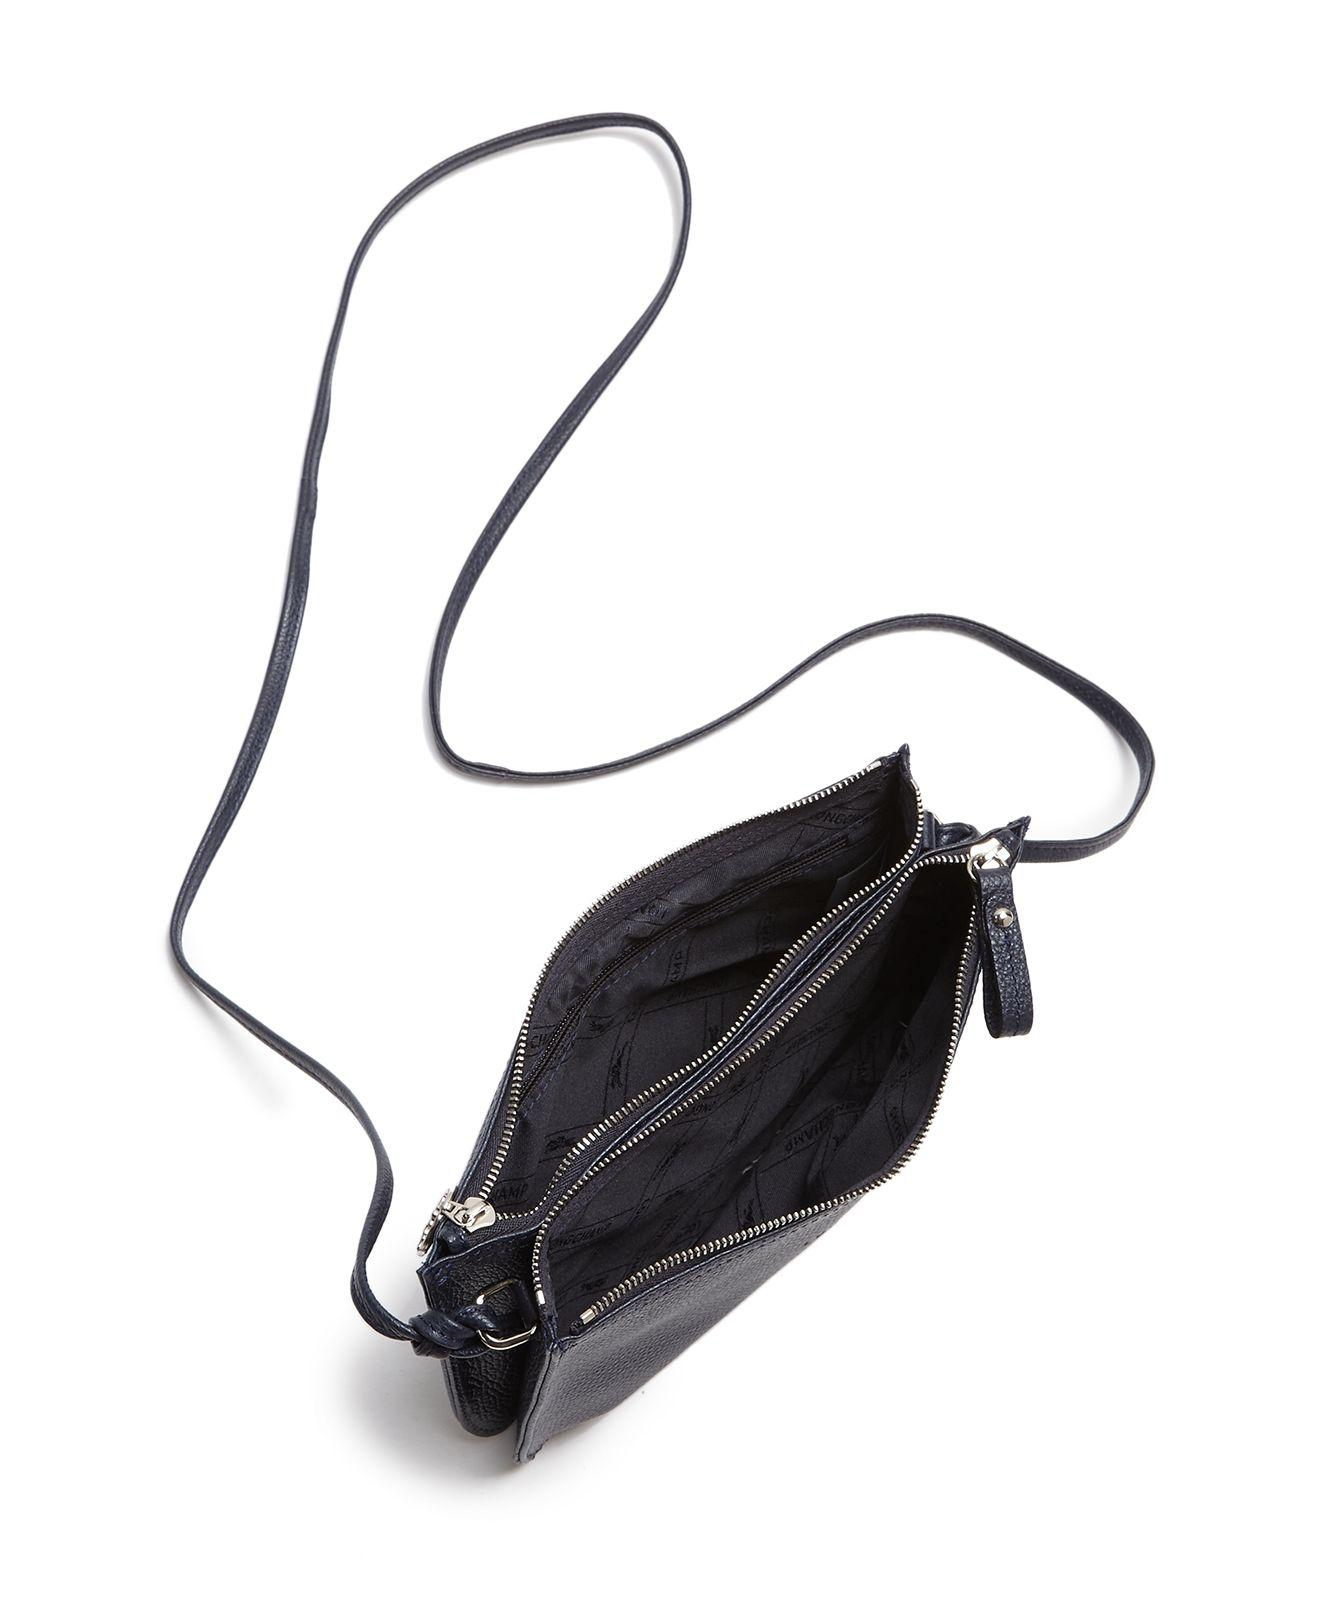 Lyst - Longchamp Le Foulonne Double Zip Leather Crossbody ffa15b83bb612